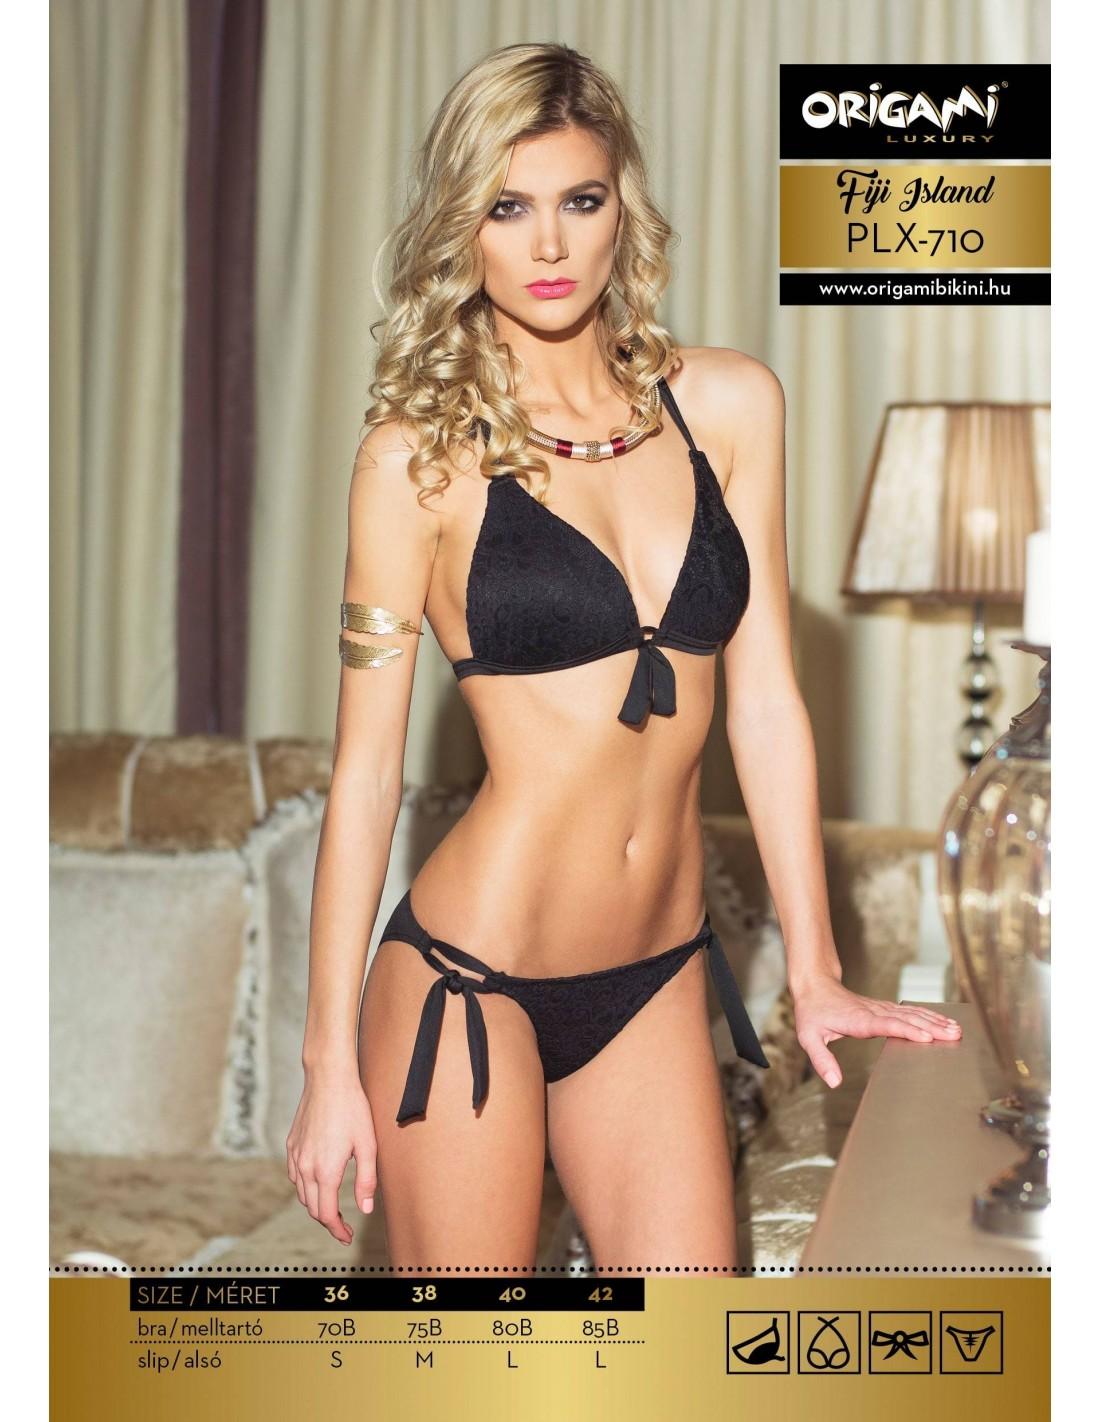 Origami Bikini Fiji Island Luxury PLX-710 feea1a448c